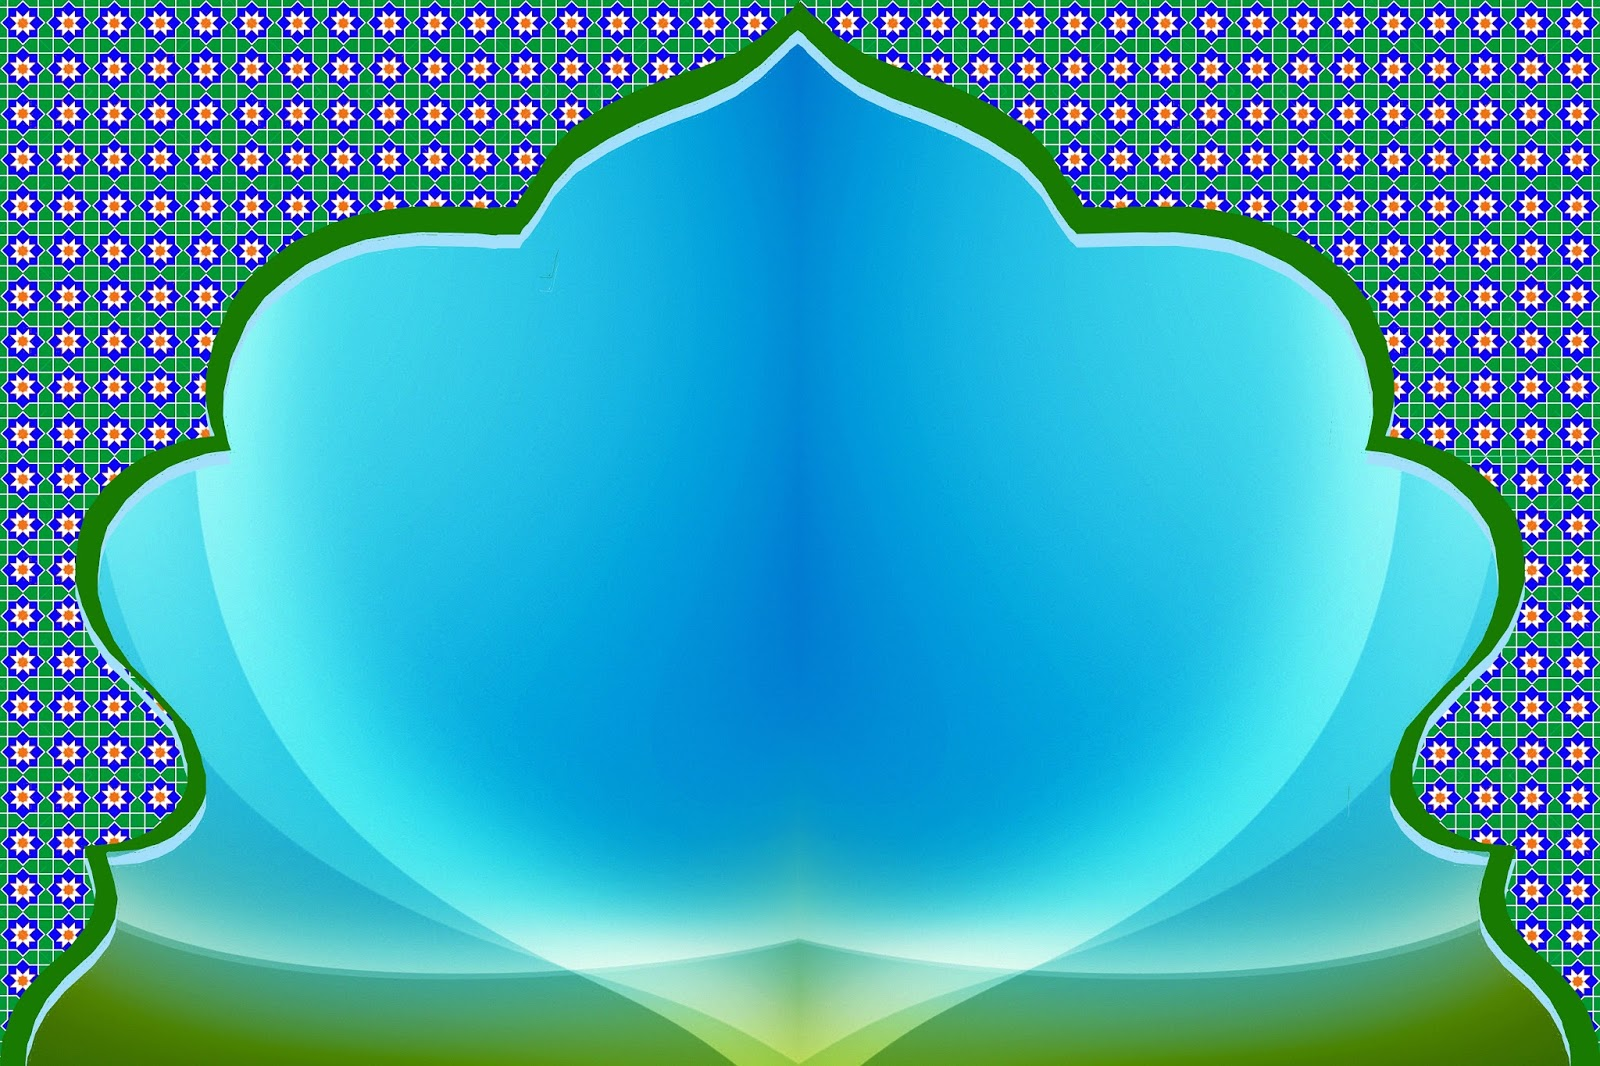 background islami biru muda